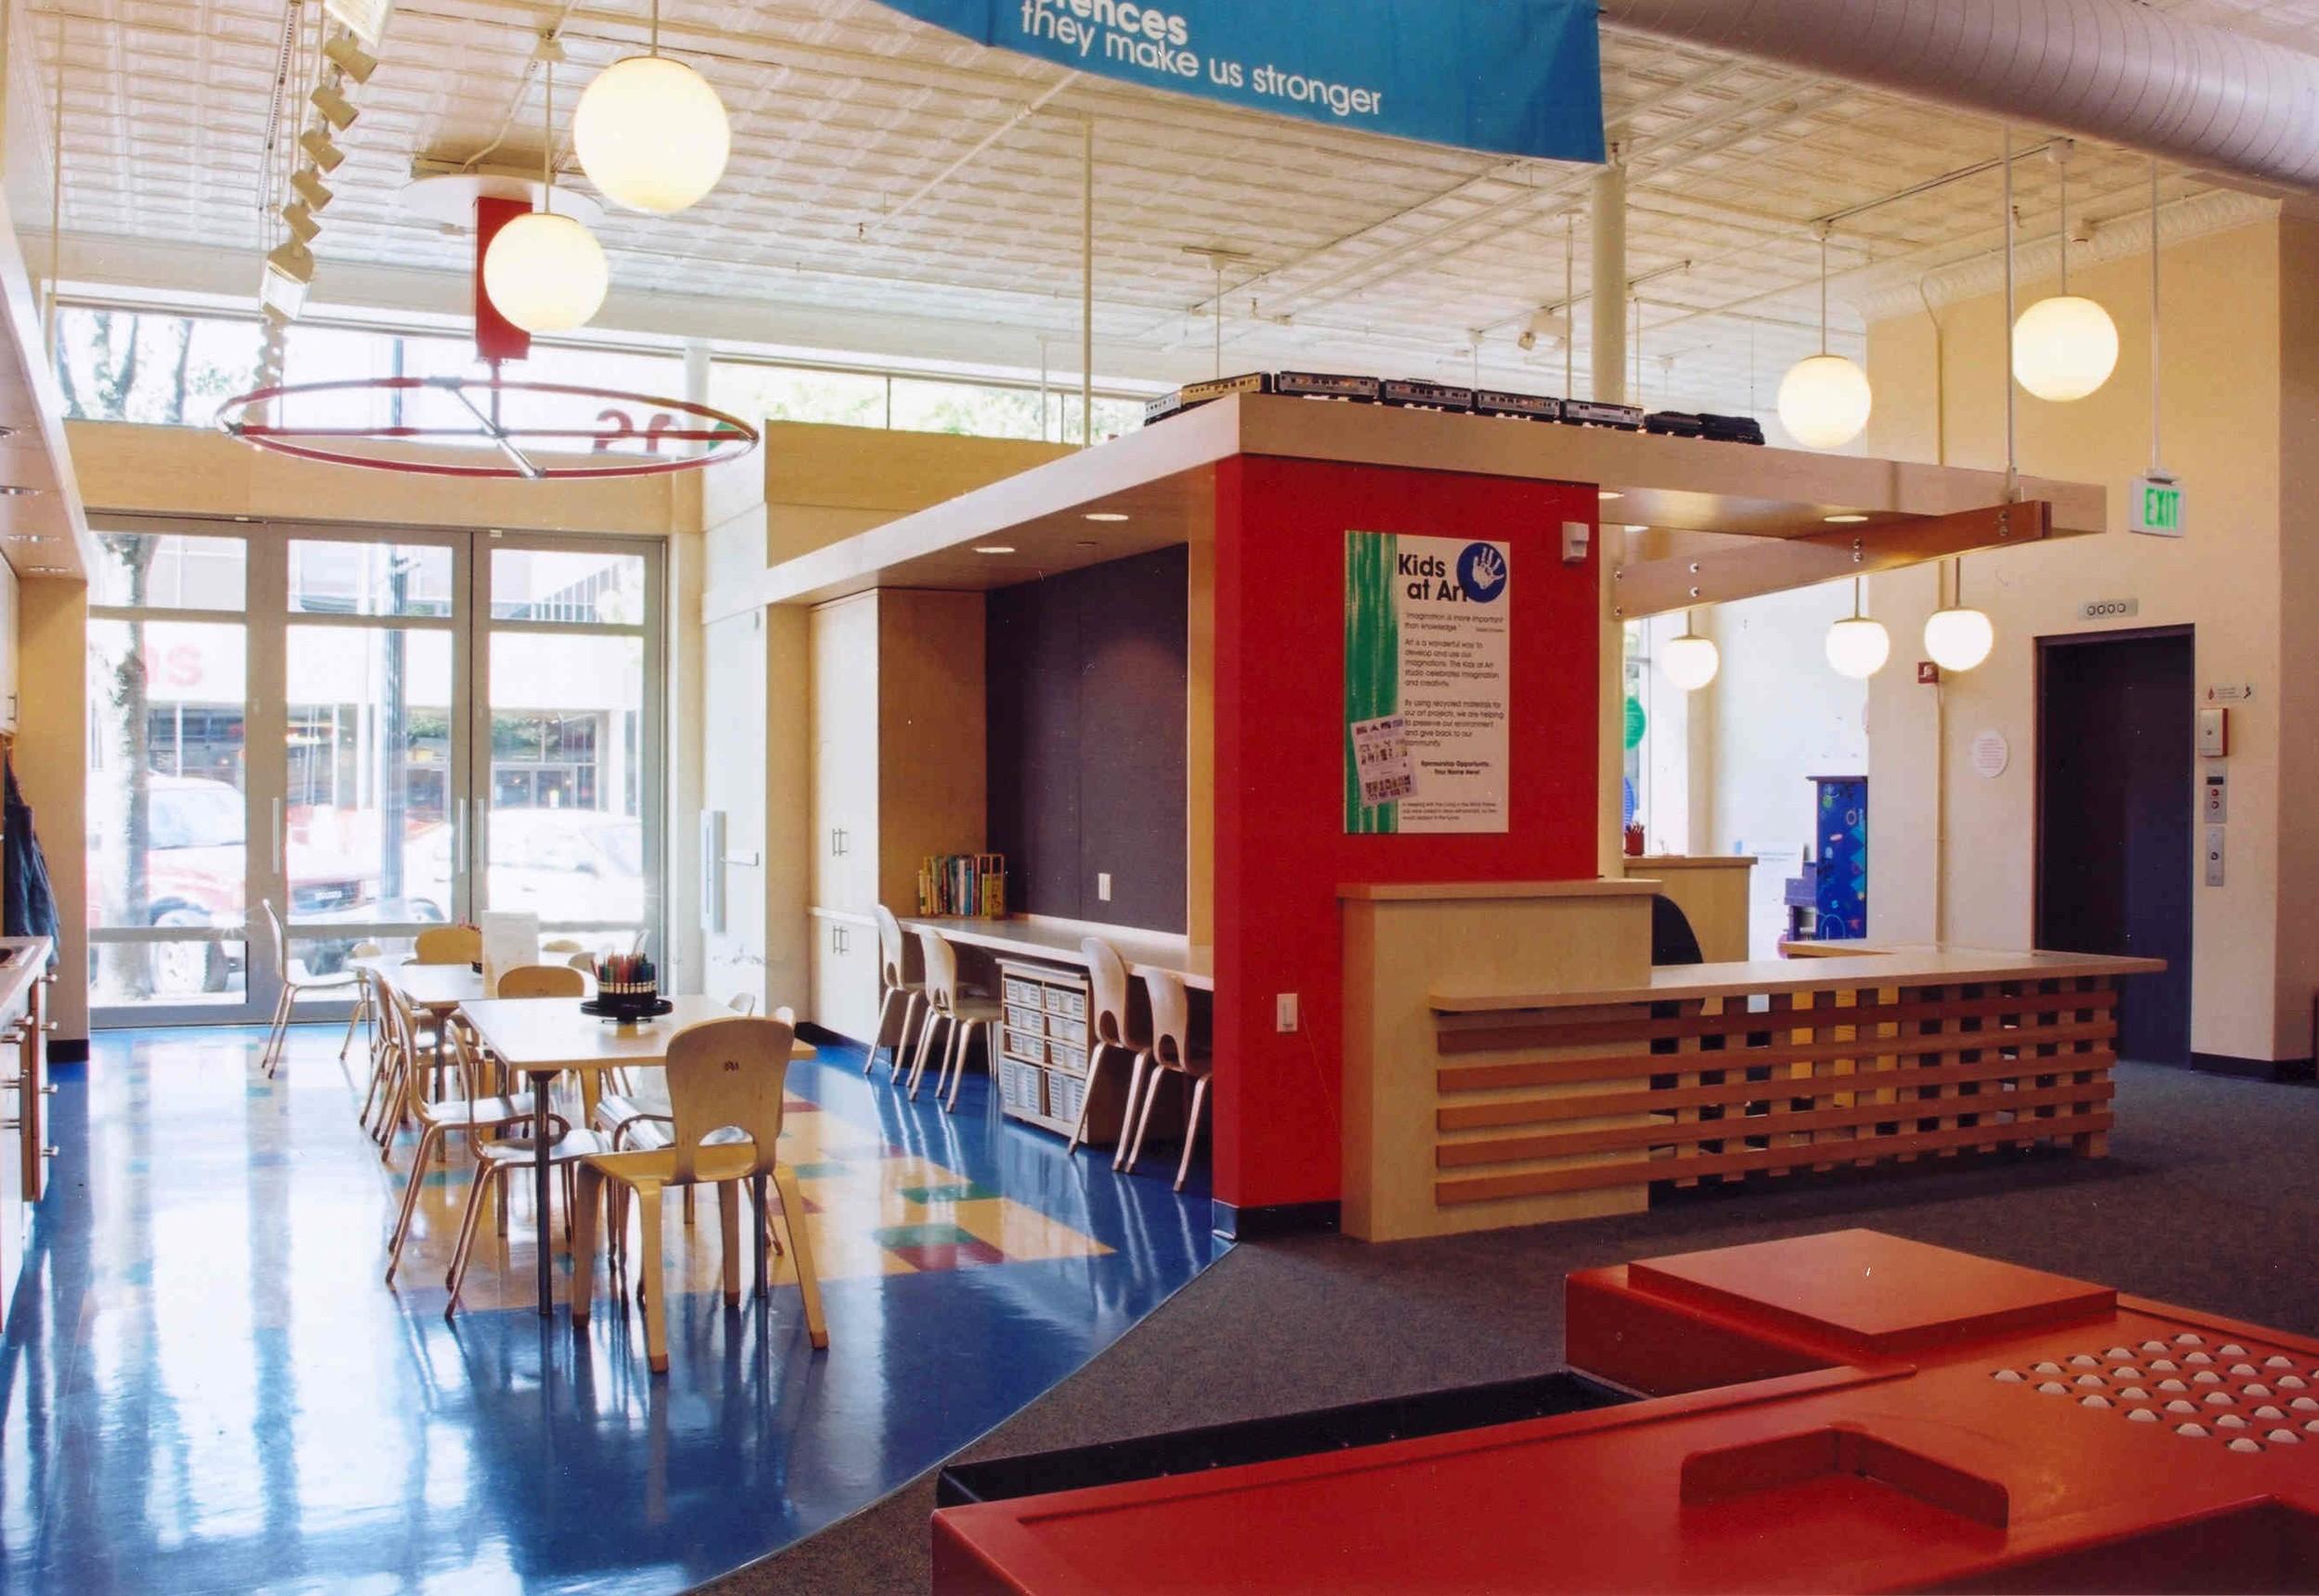 Art area and reception desk